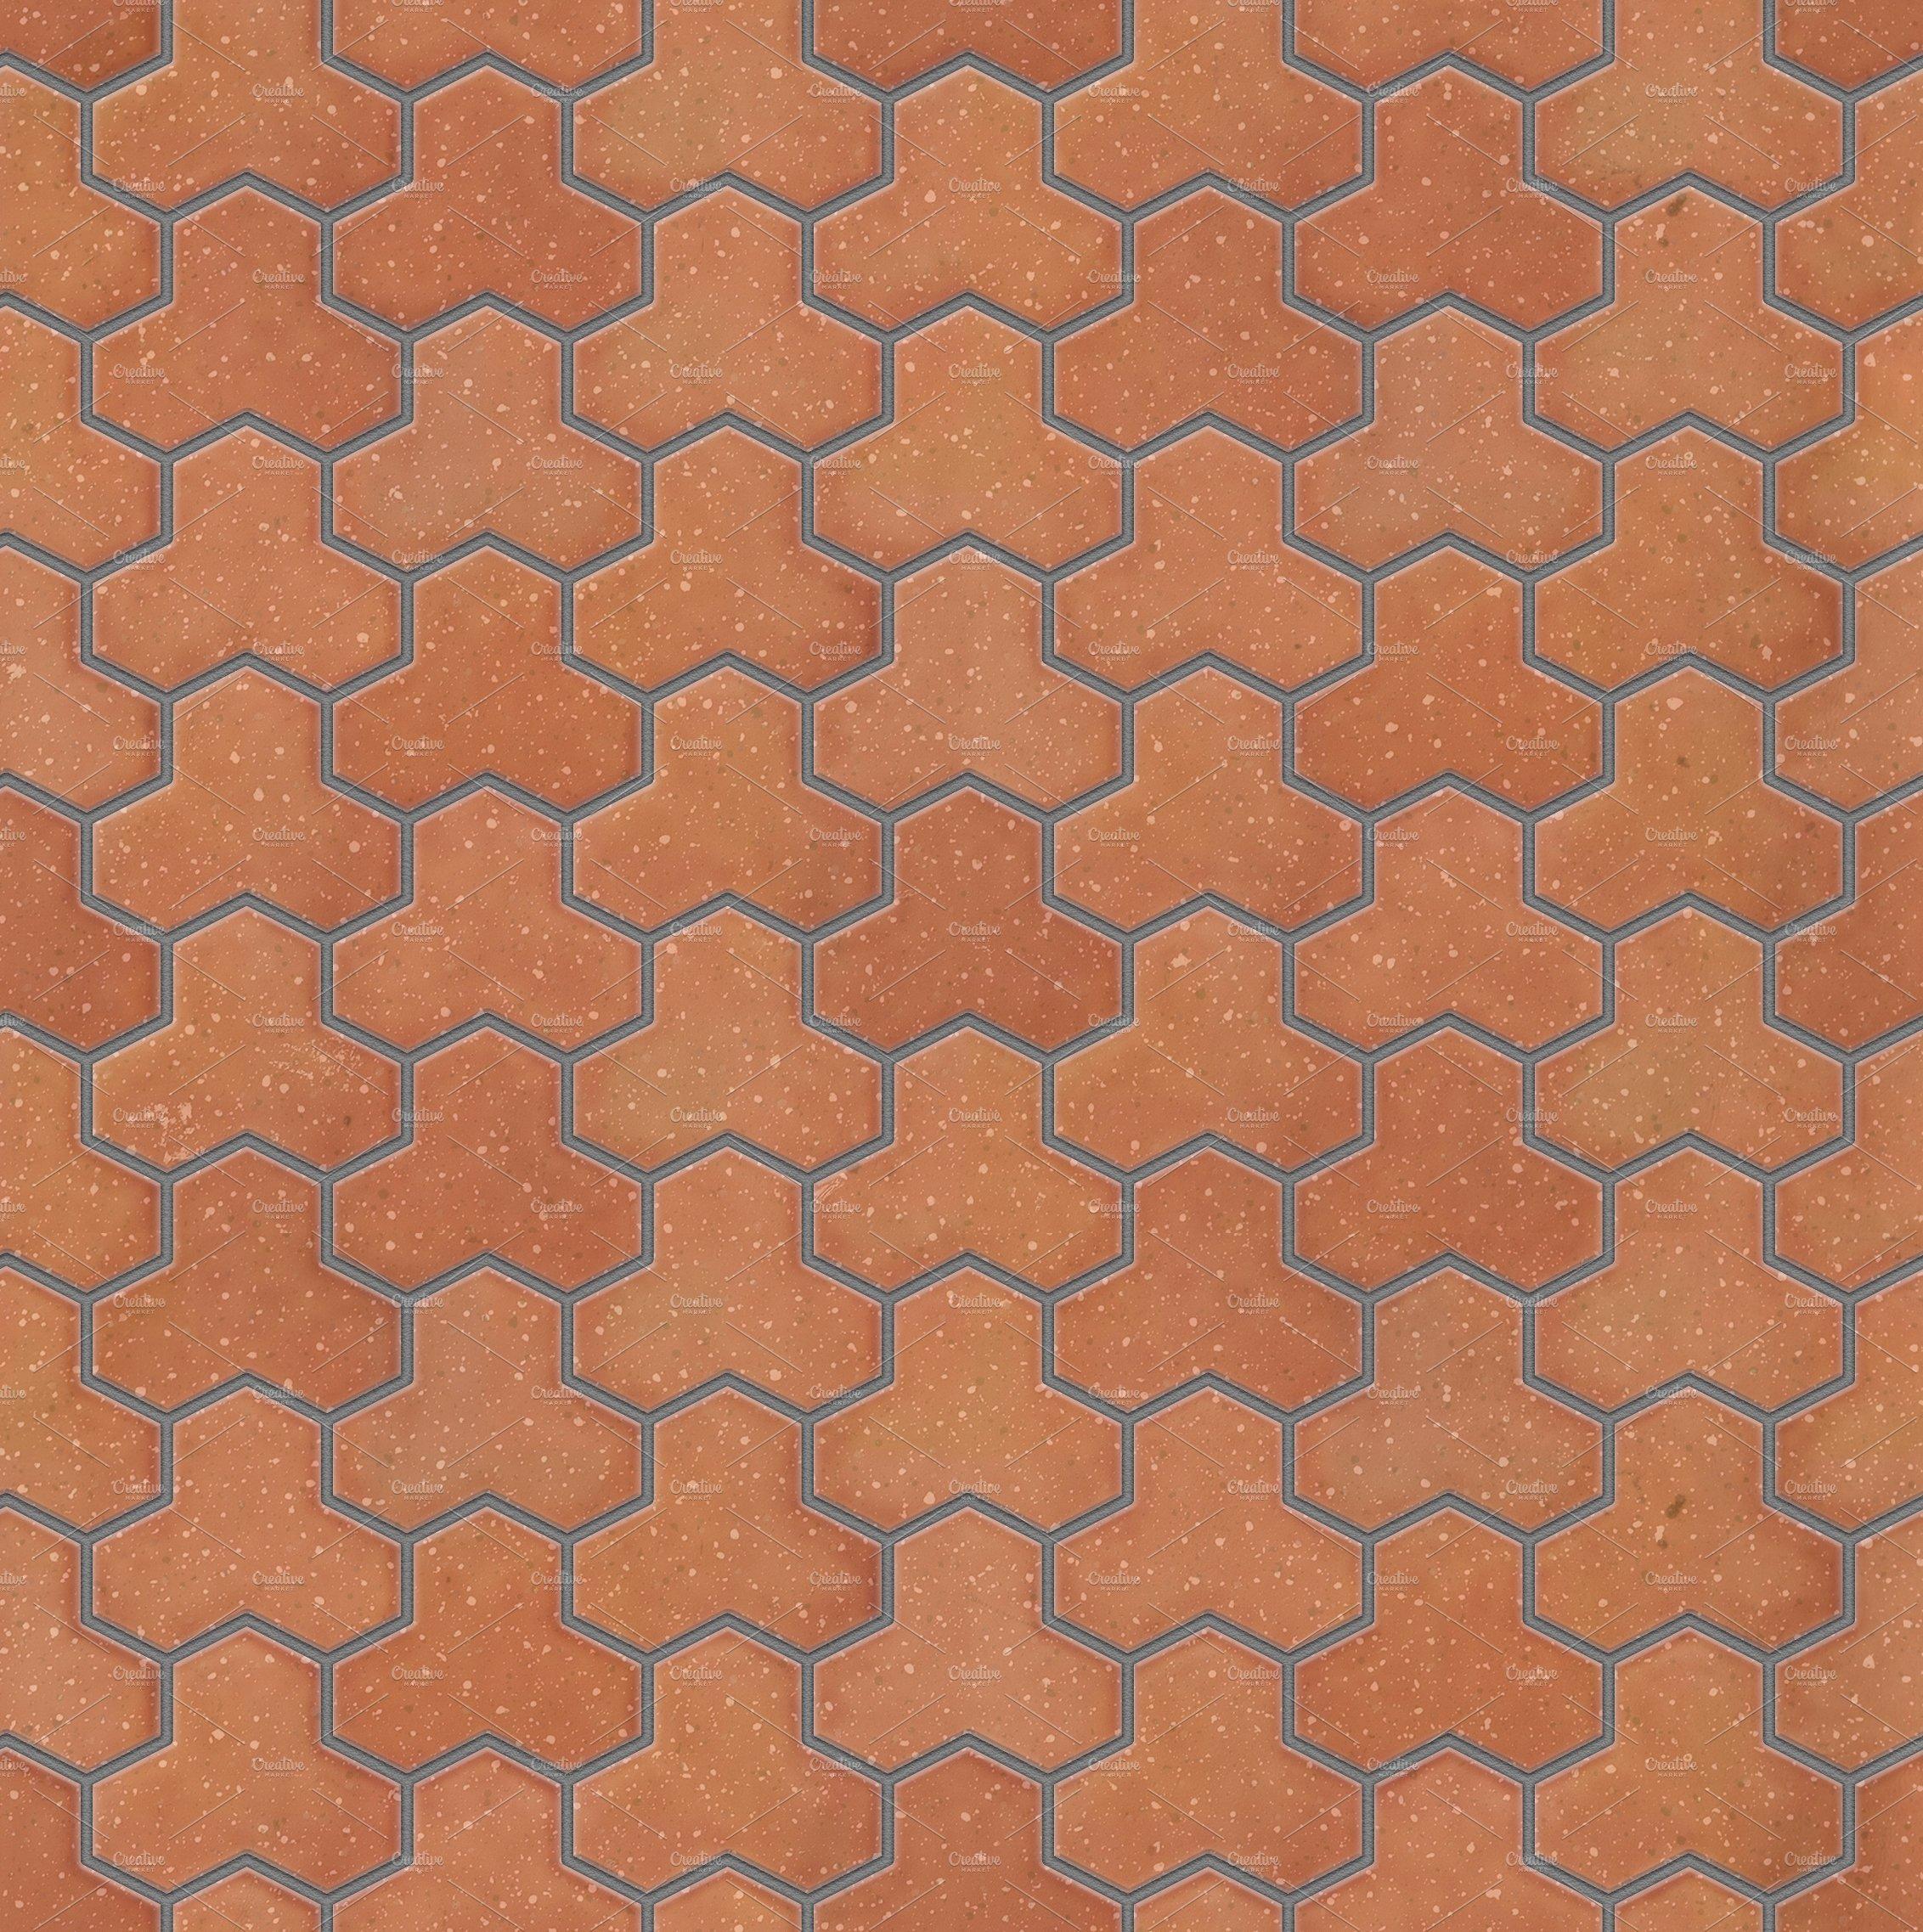 Trihex brick pavers seamless texture | Custom-Designed Textures ~ Creative  Market